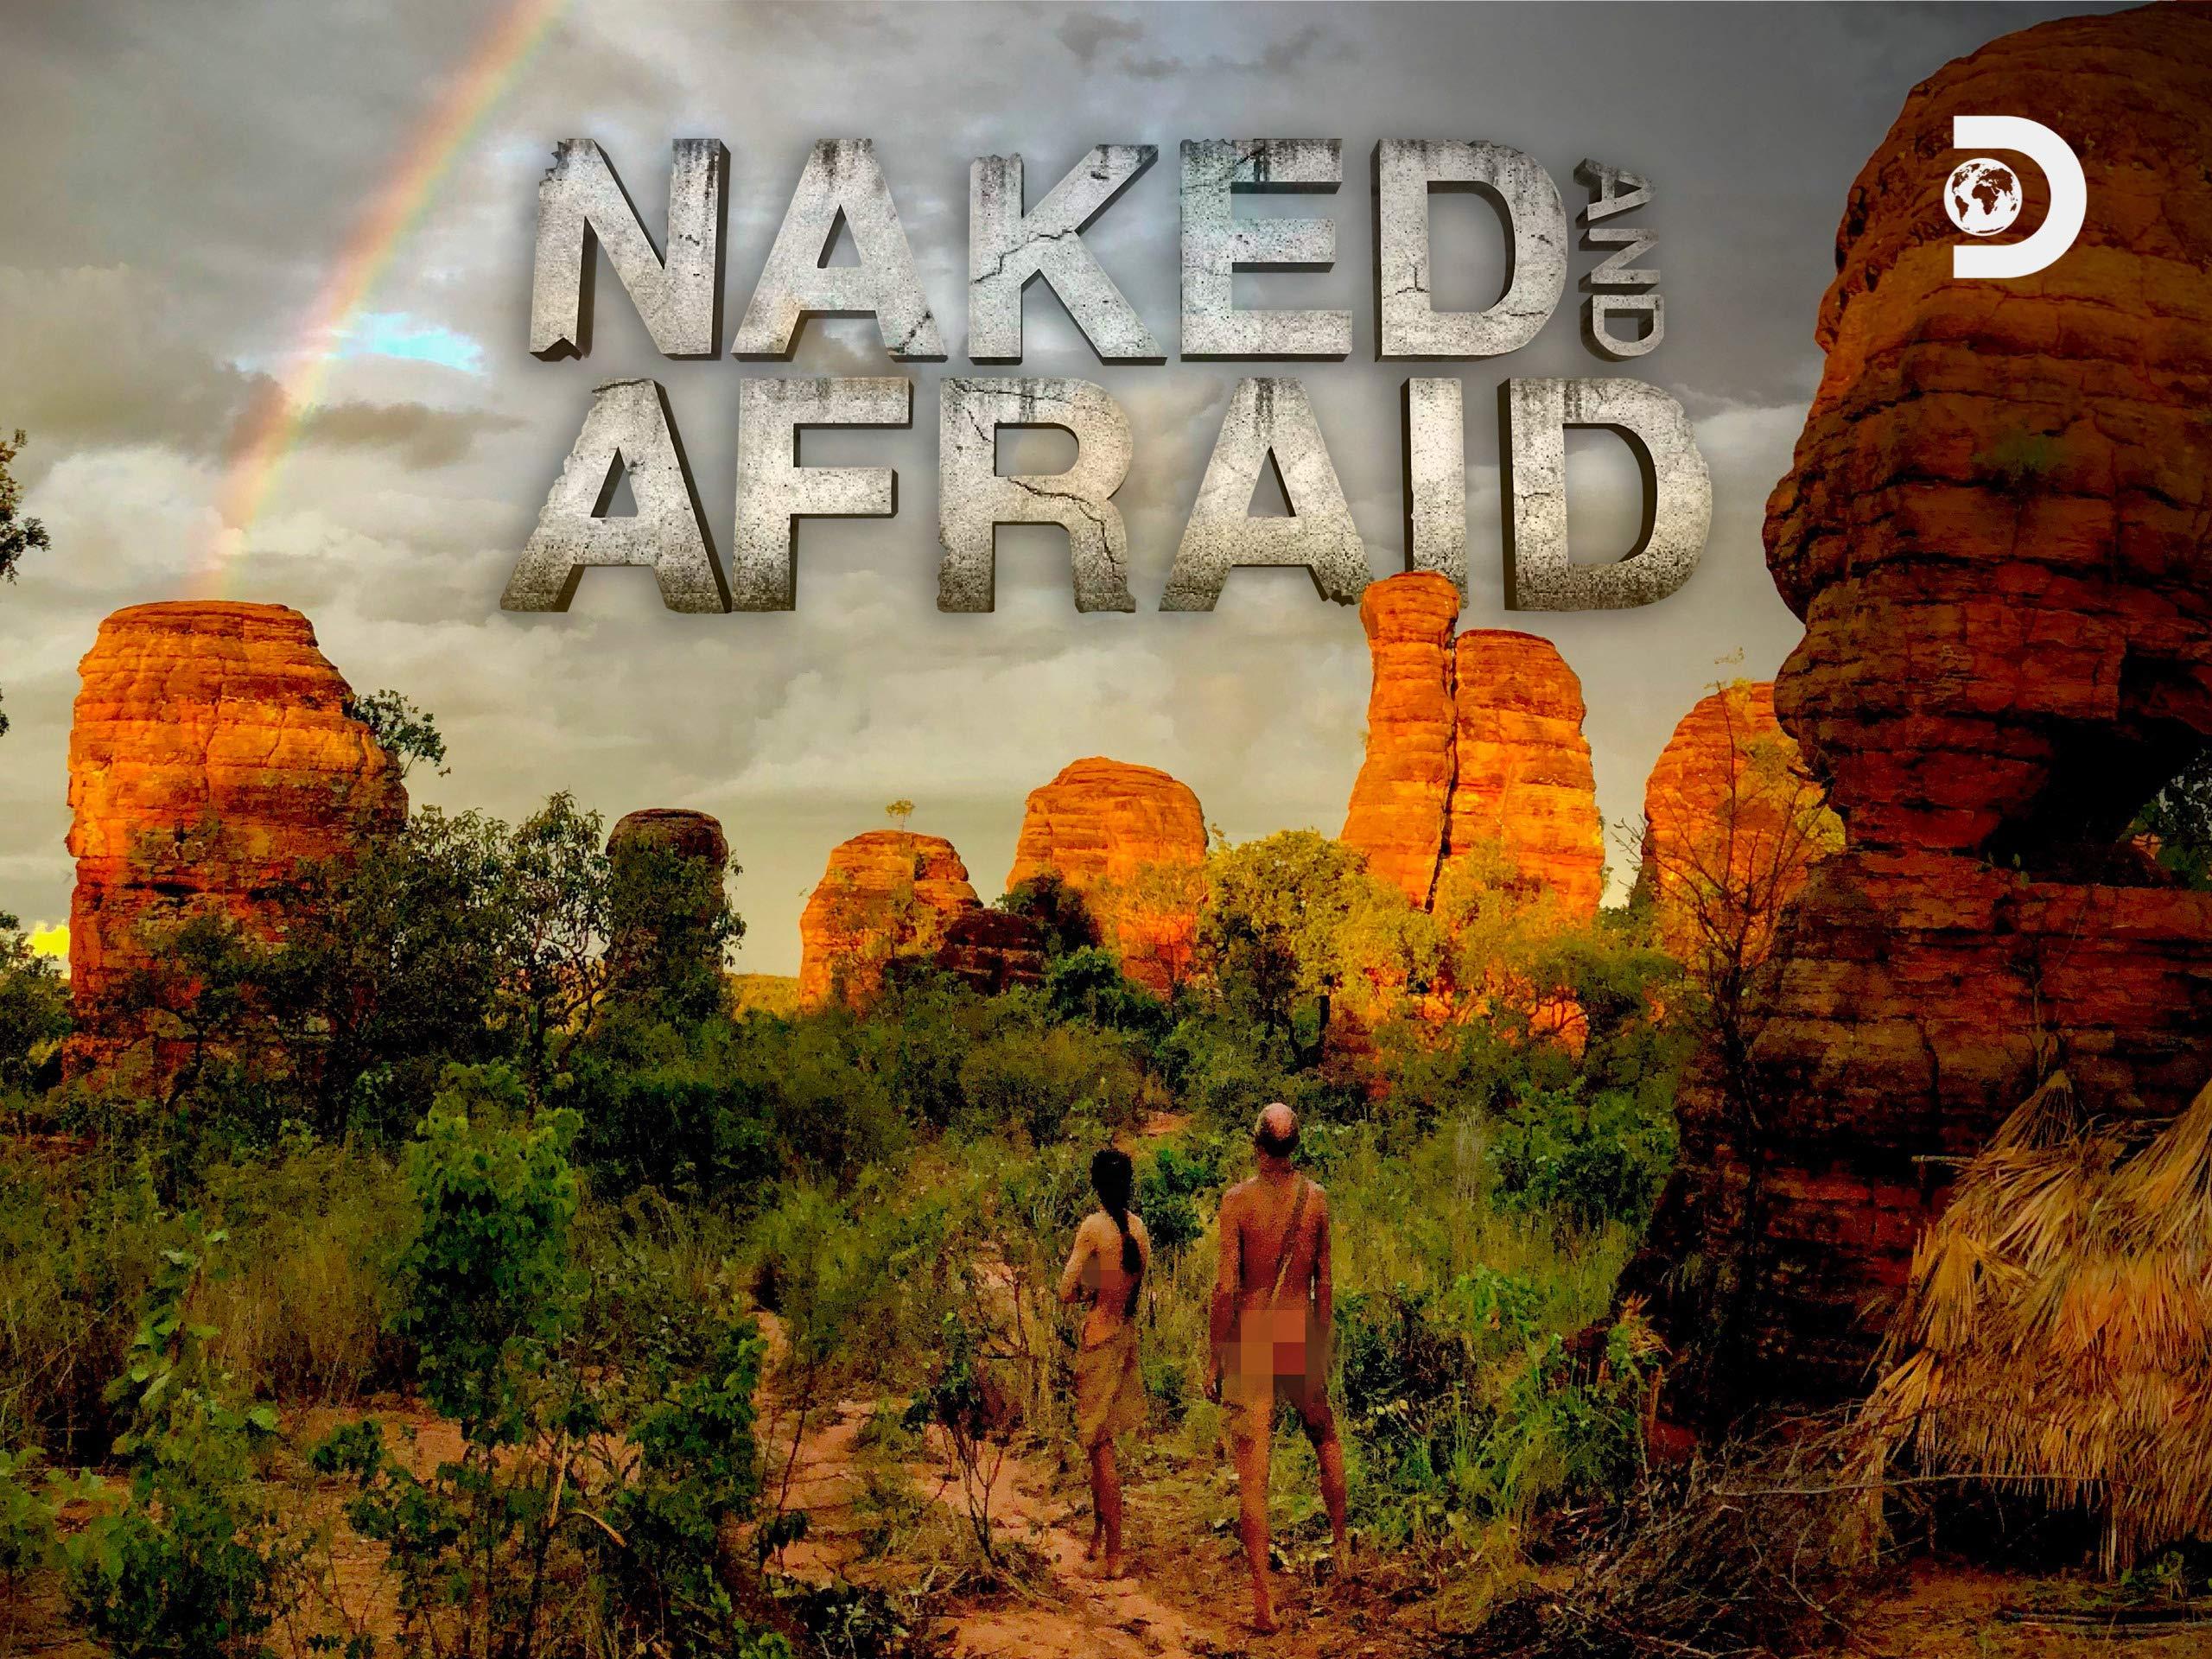 Naked and Afraid XL, Season 2 on iTunes